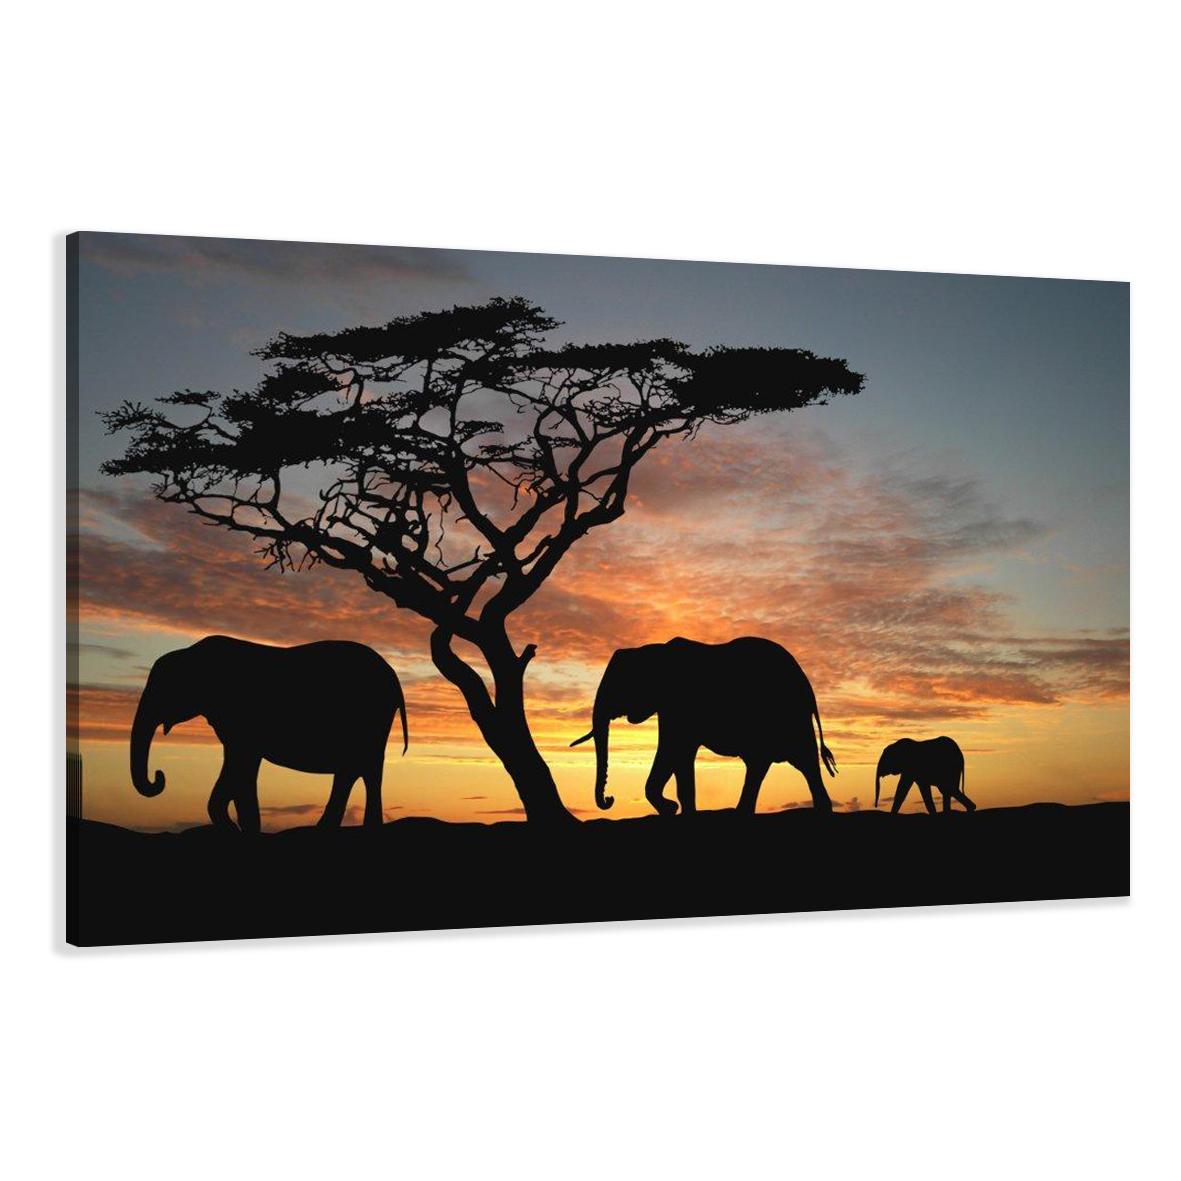 bilder wandbild kunstdruck bild leinwandbild deutsches lager marke 1576 d5 ebay. Black Bedroom Furniture Sets. Home Design Ideas